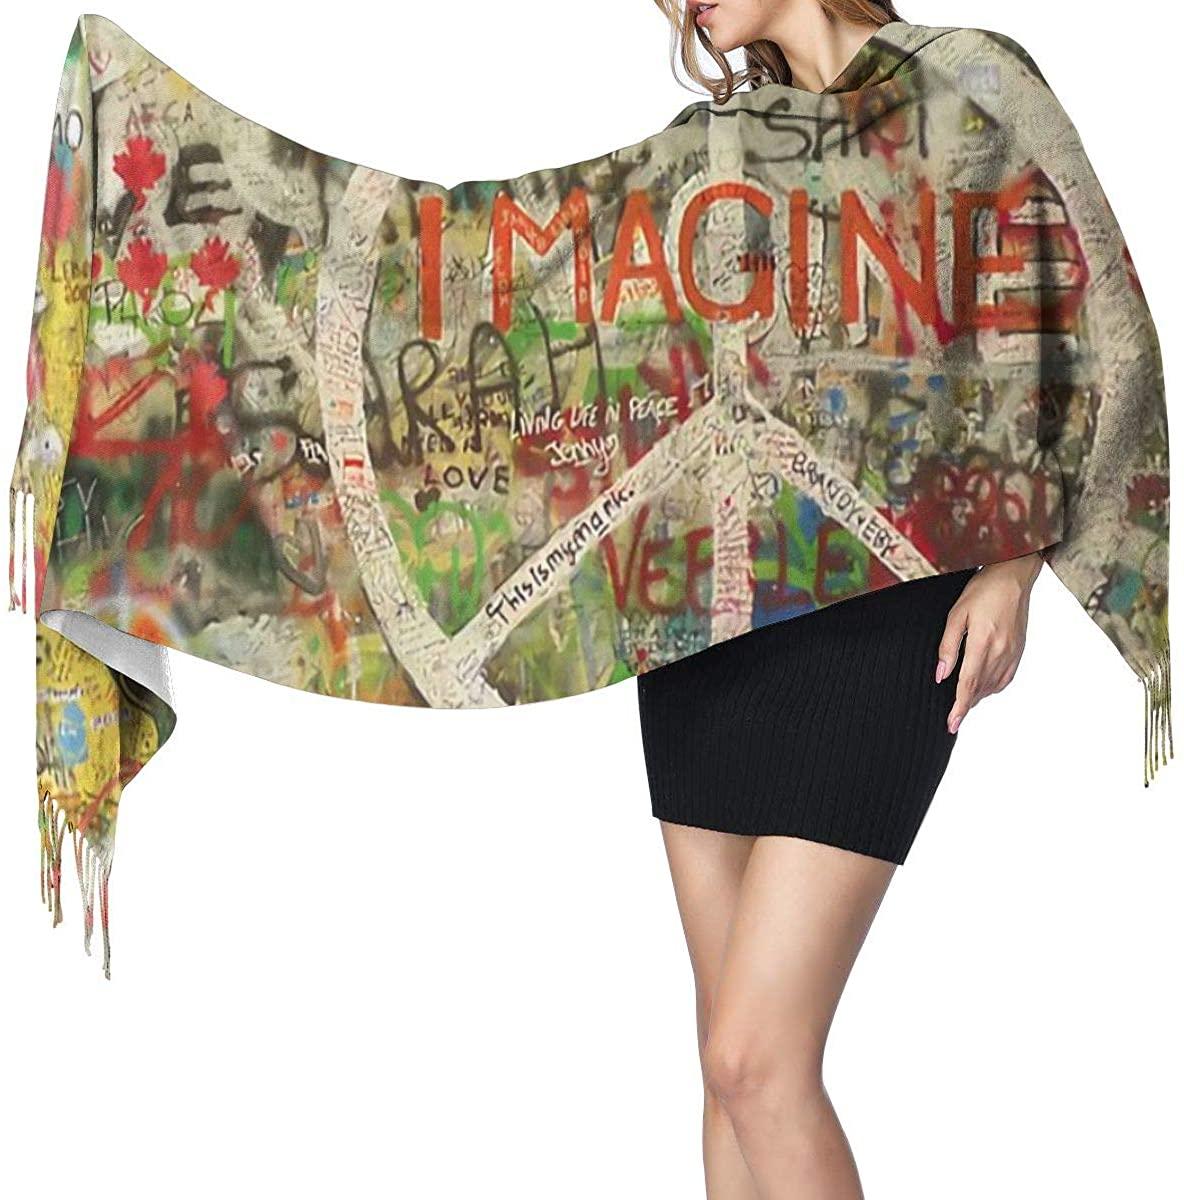 Peace Sign Graffiti Women's Winter Warm Scarf Fashion Long Large Soft Cashmere Shawl Wrap Scarves